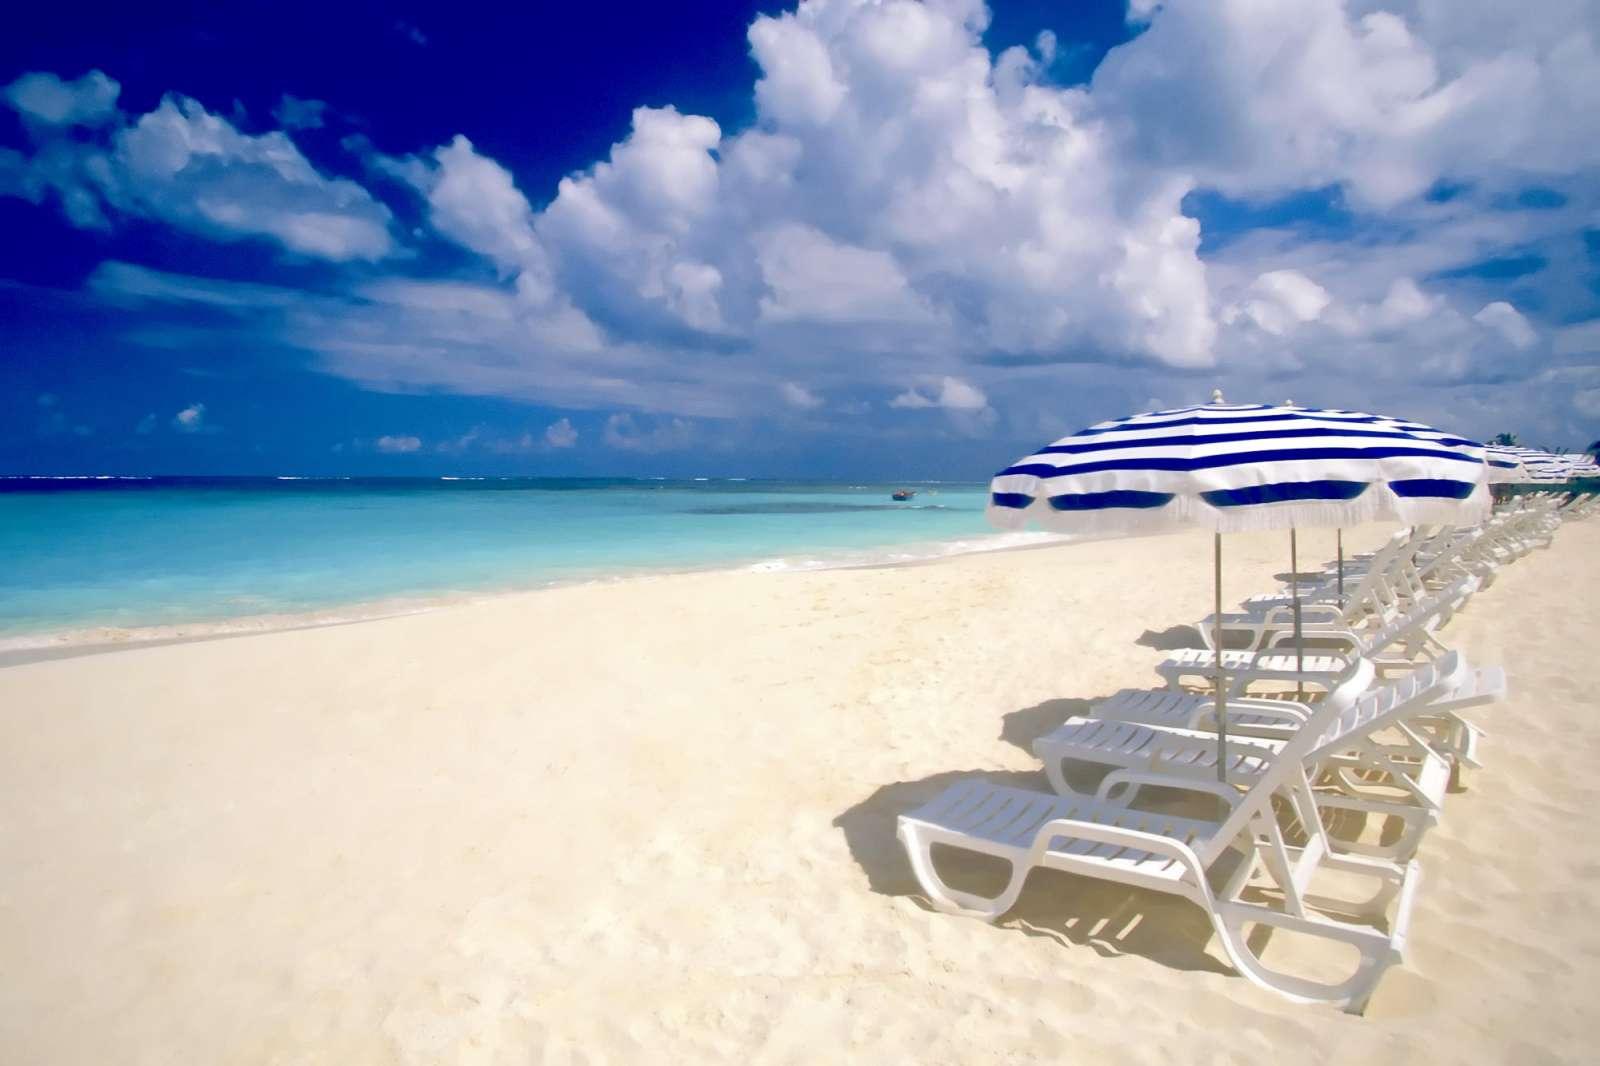 Scenes Wallpapers   Download Shoal Bay Beach Anguilla Wallpapers 1600x1066